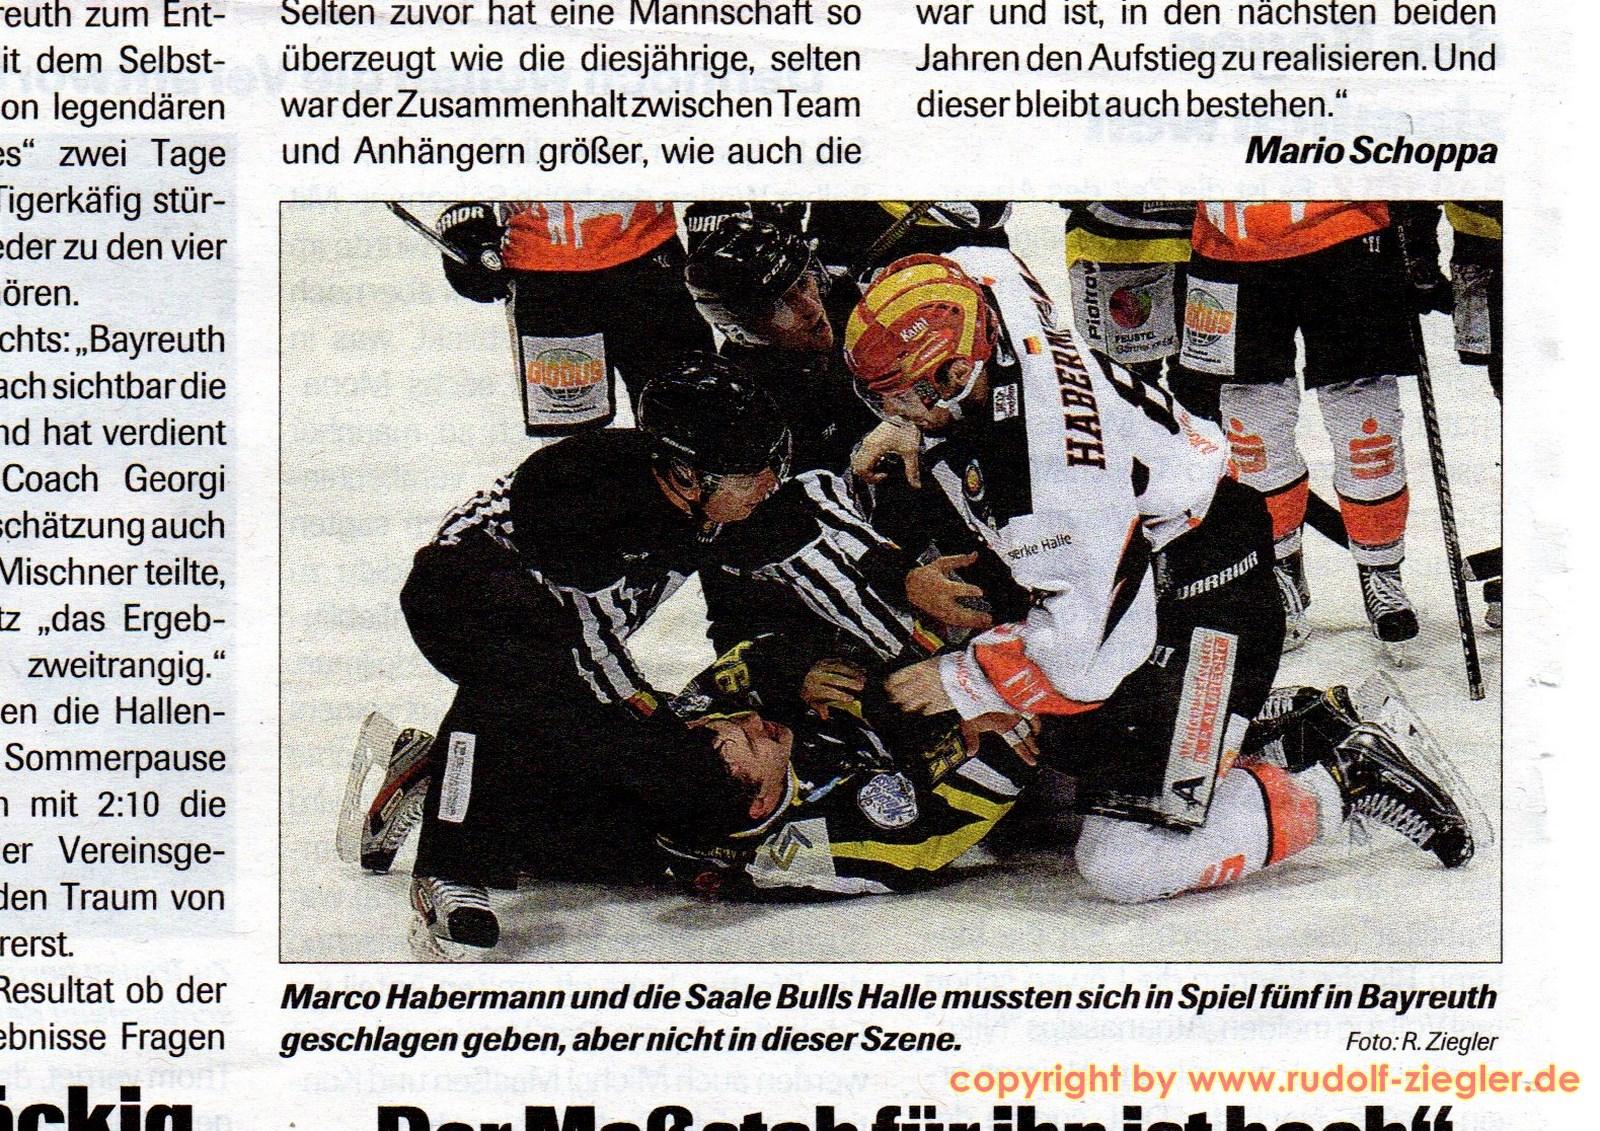 Eishockey NEWS 2016-04-05 Seite 64 - A (1600x1200)